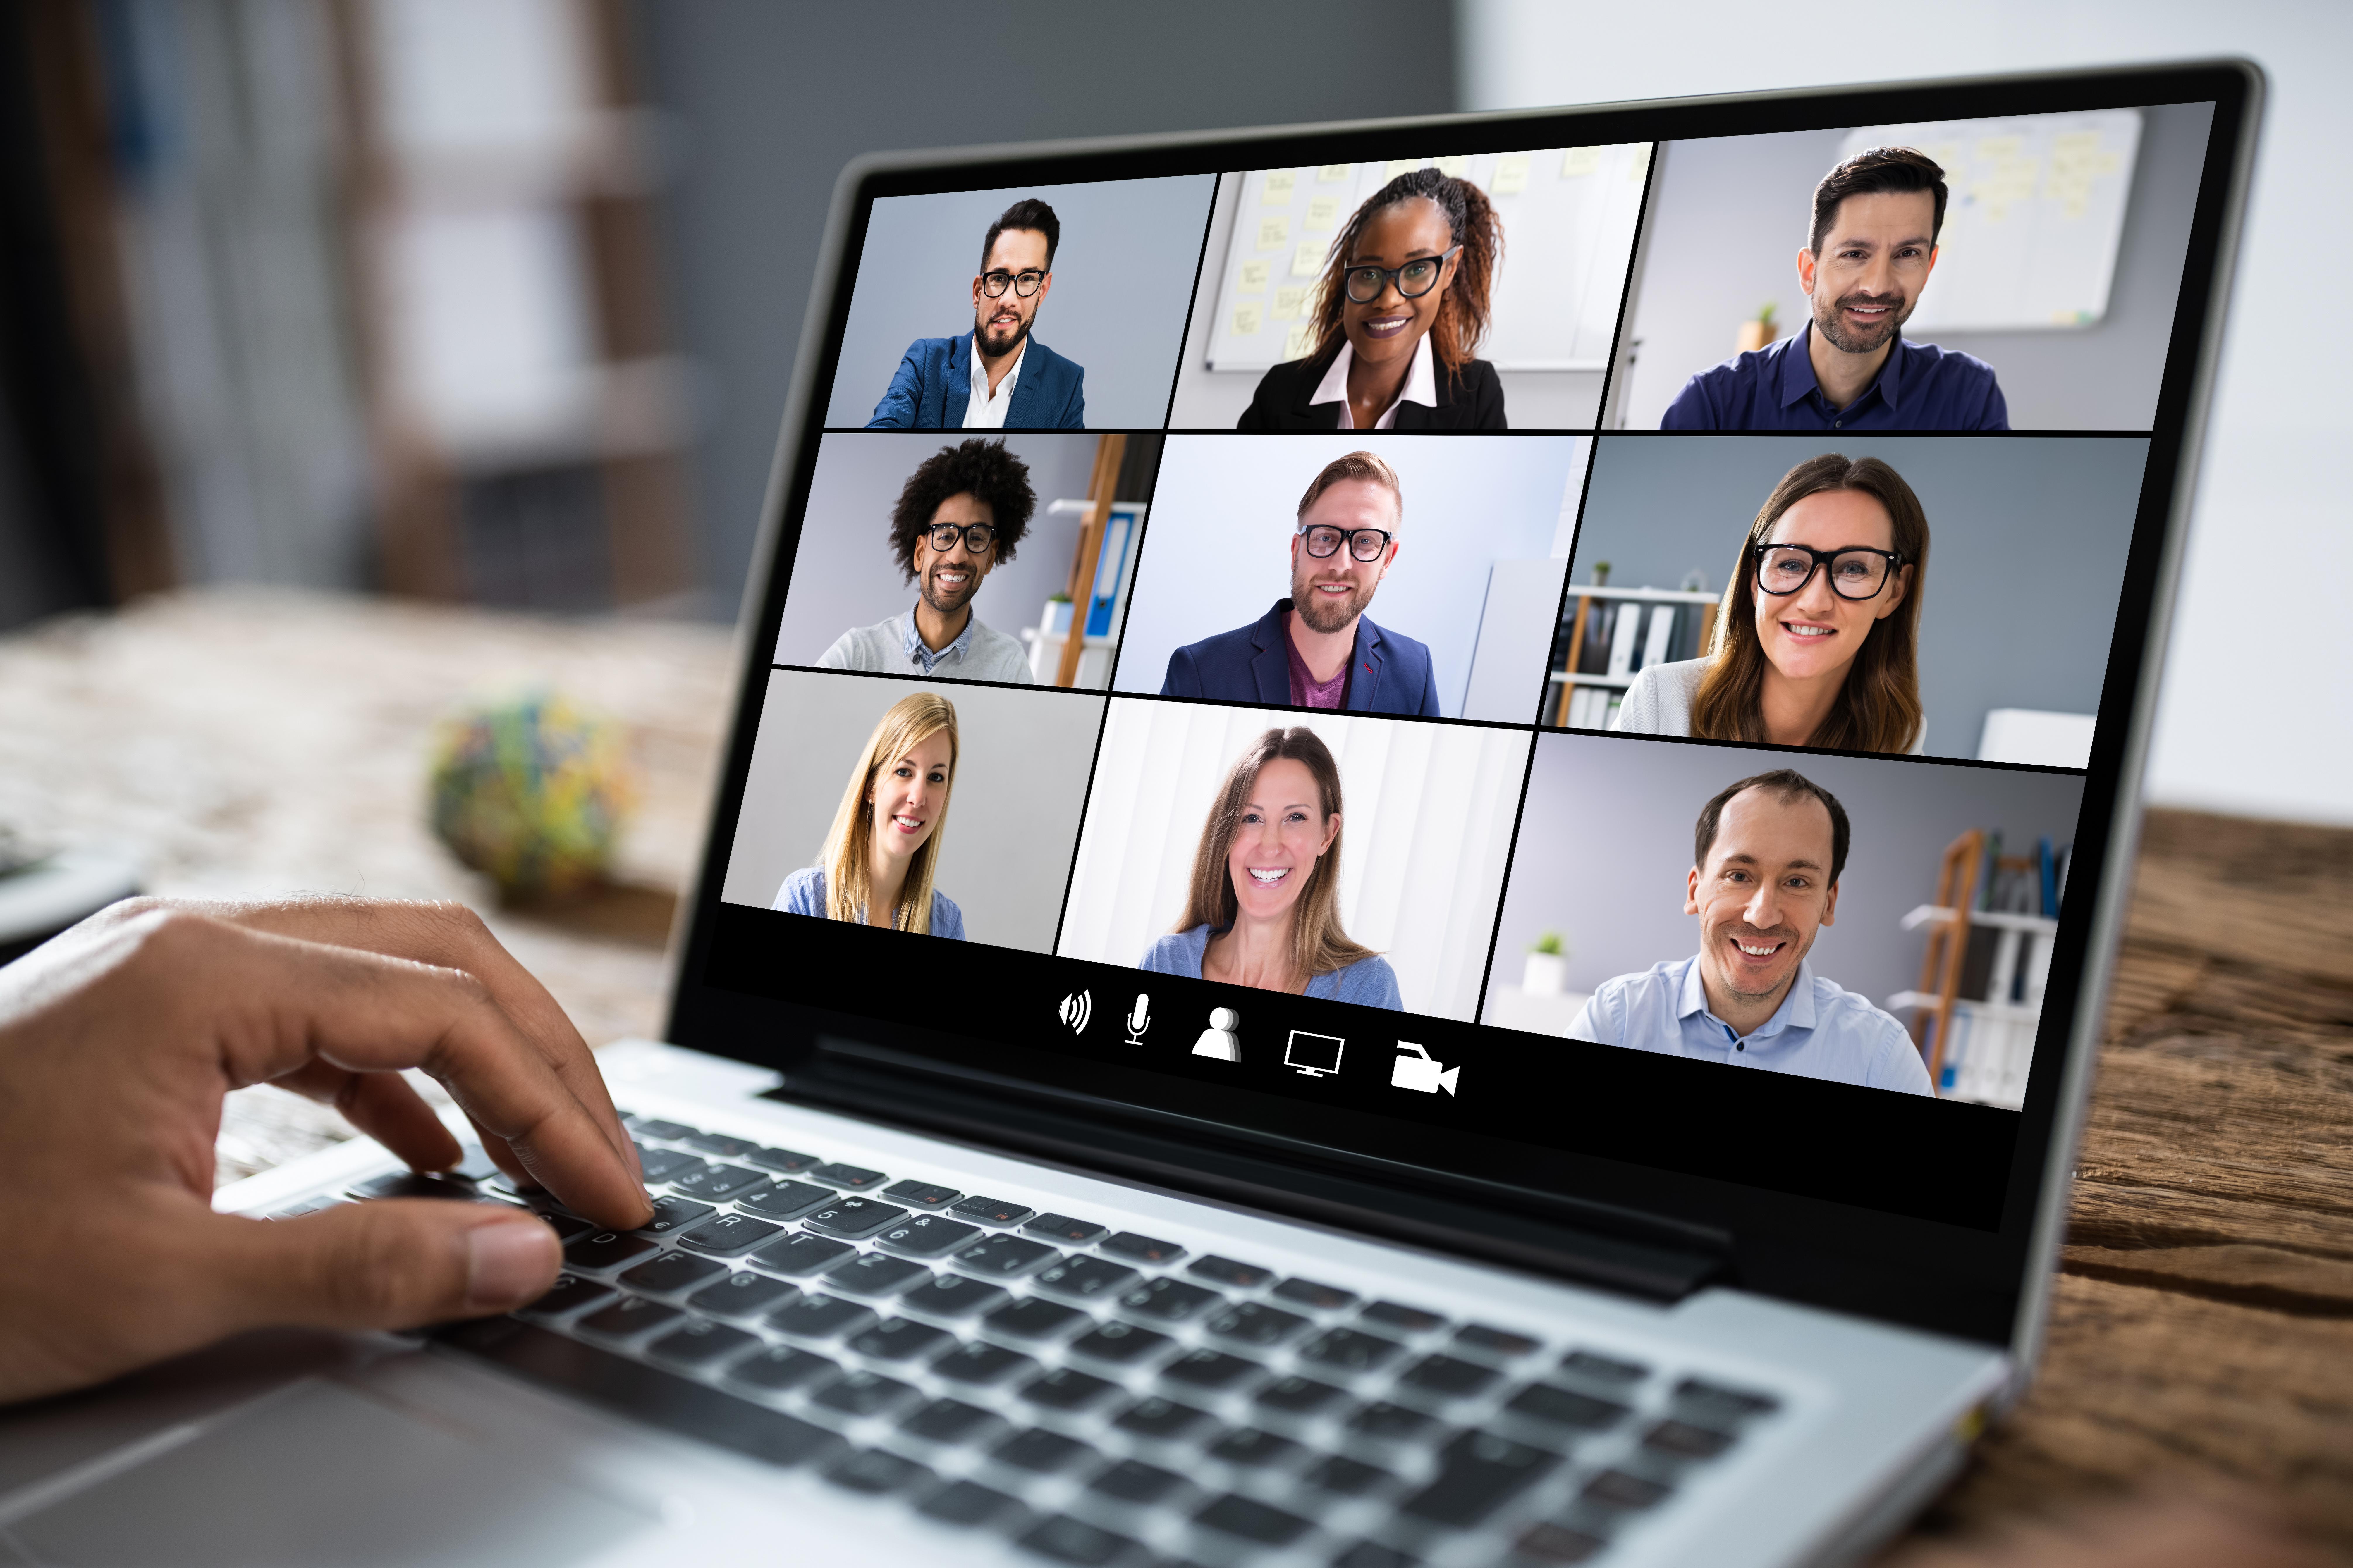 Online-Workshop-Reihe: Webinare lernwirksam gestalten